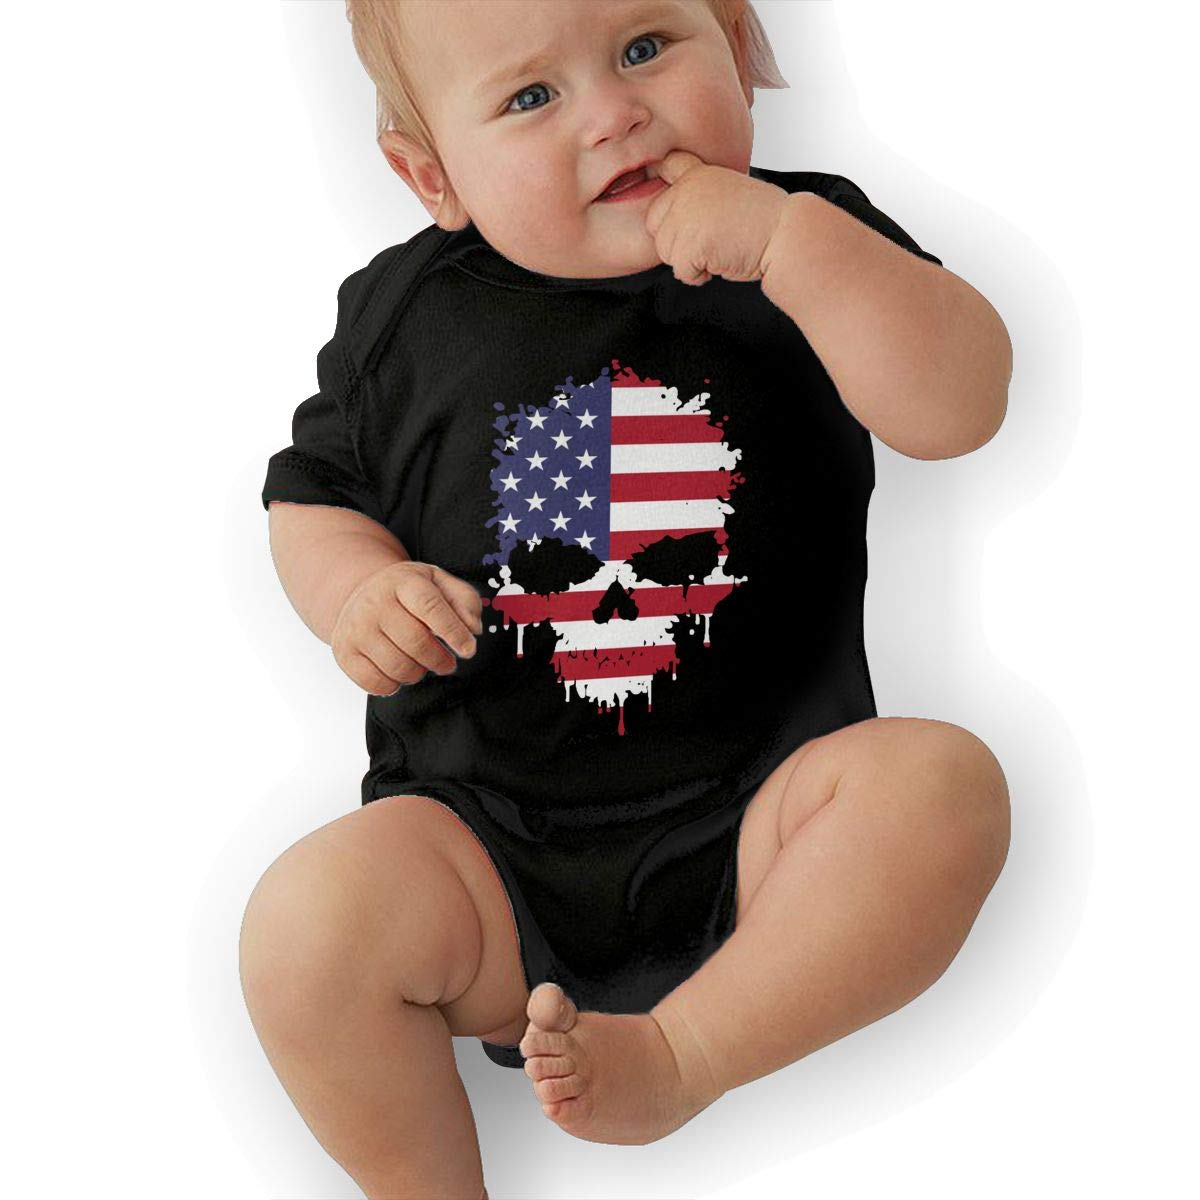 Soft American Skull Sleepwear U88oi-8 Short Sleeve Cotton Bodysuit for Baby Girls Boys